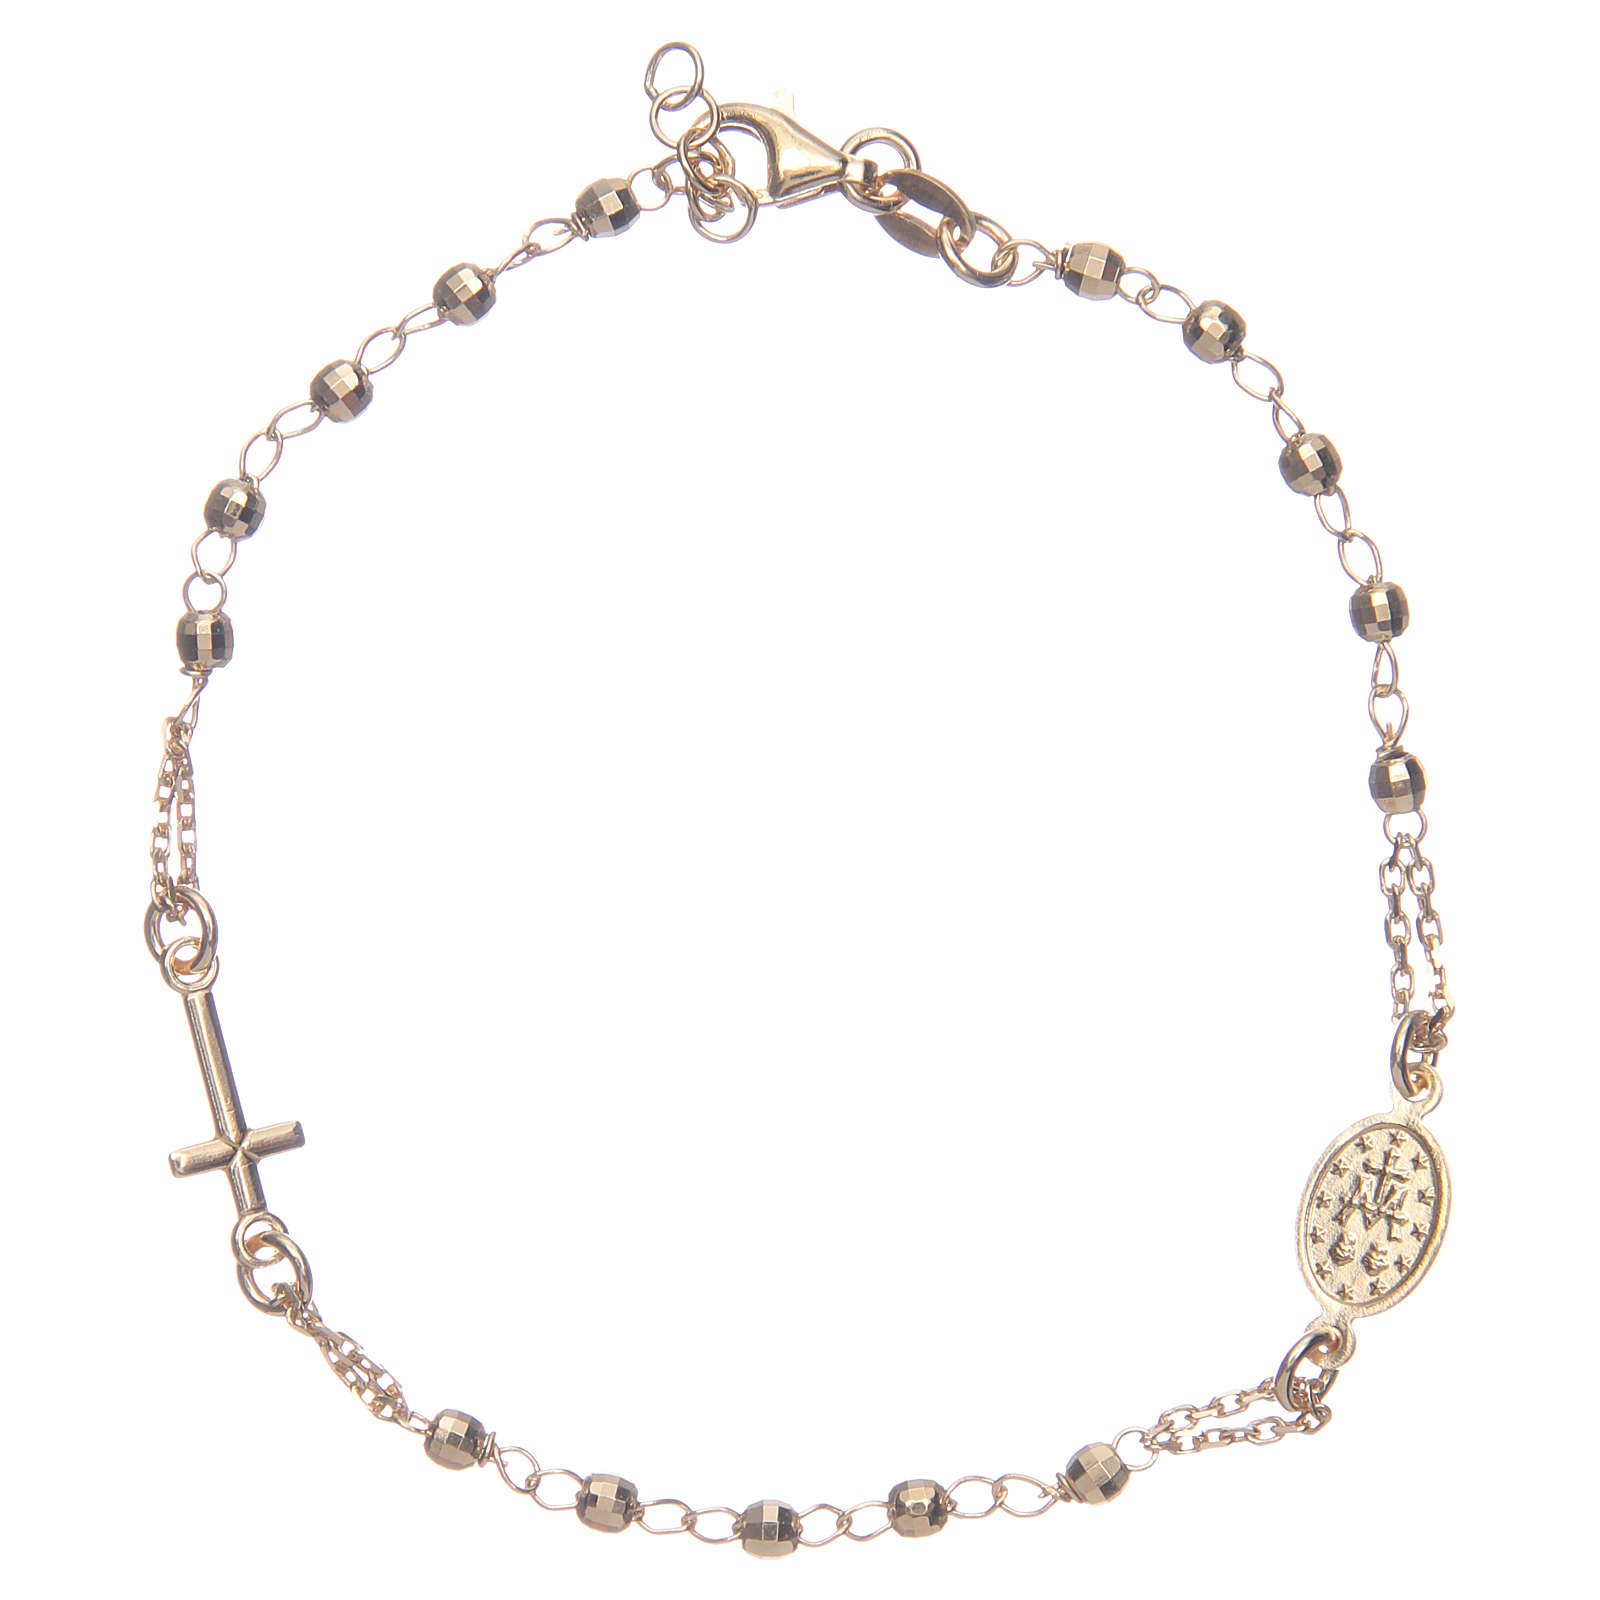 Rosary bracelet gold 925 sterling silver 4